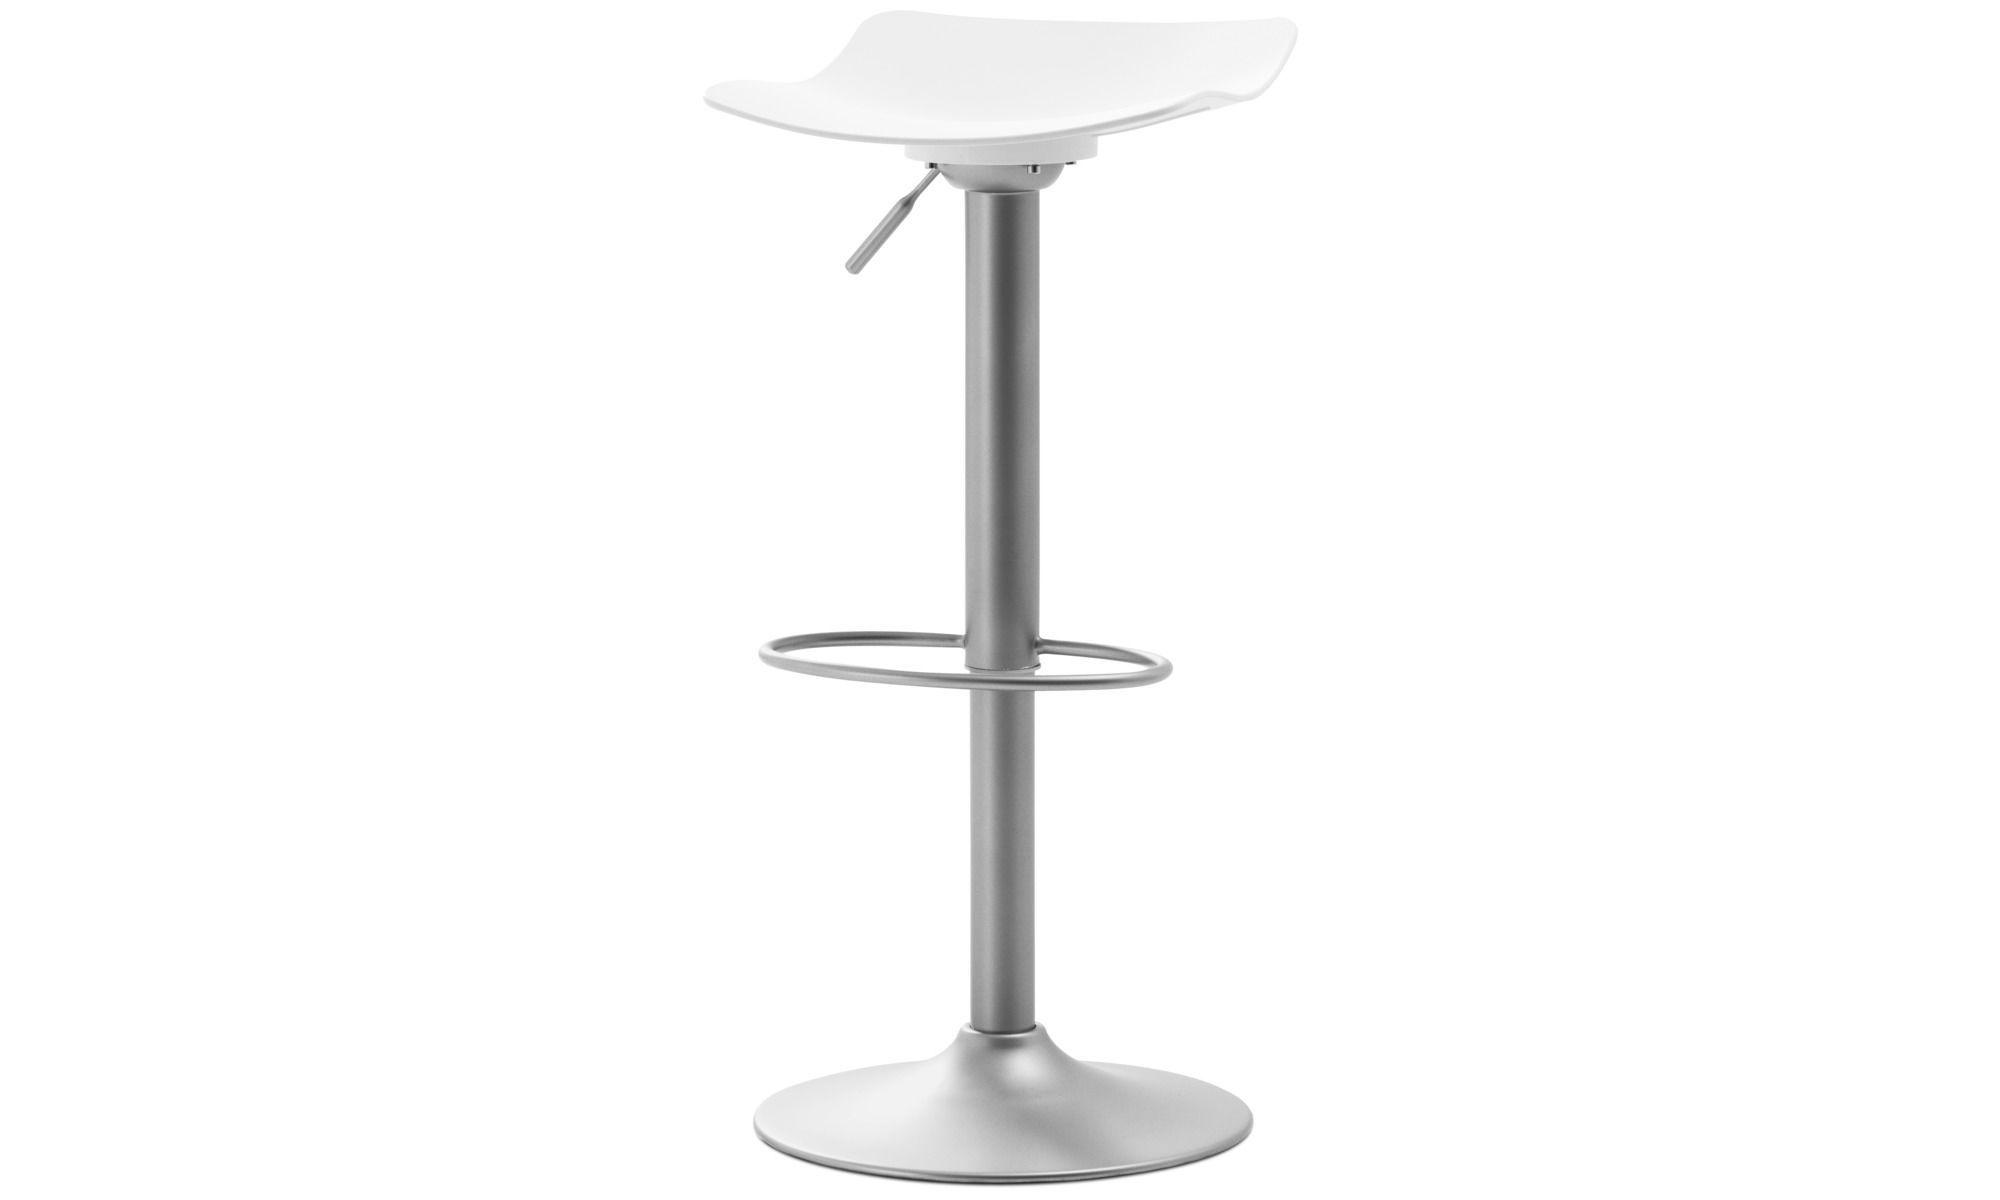 Barstools Torup Barstool With Gas Cartridge White Plastic Bar Stools Contemporary Bar Stools Modern Bar Stools